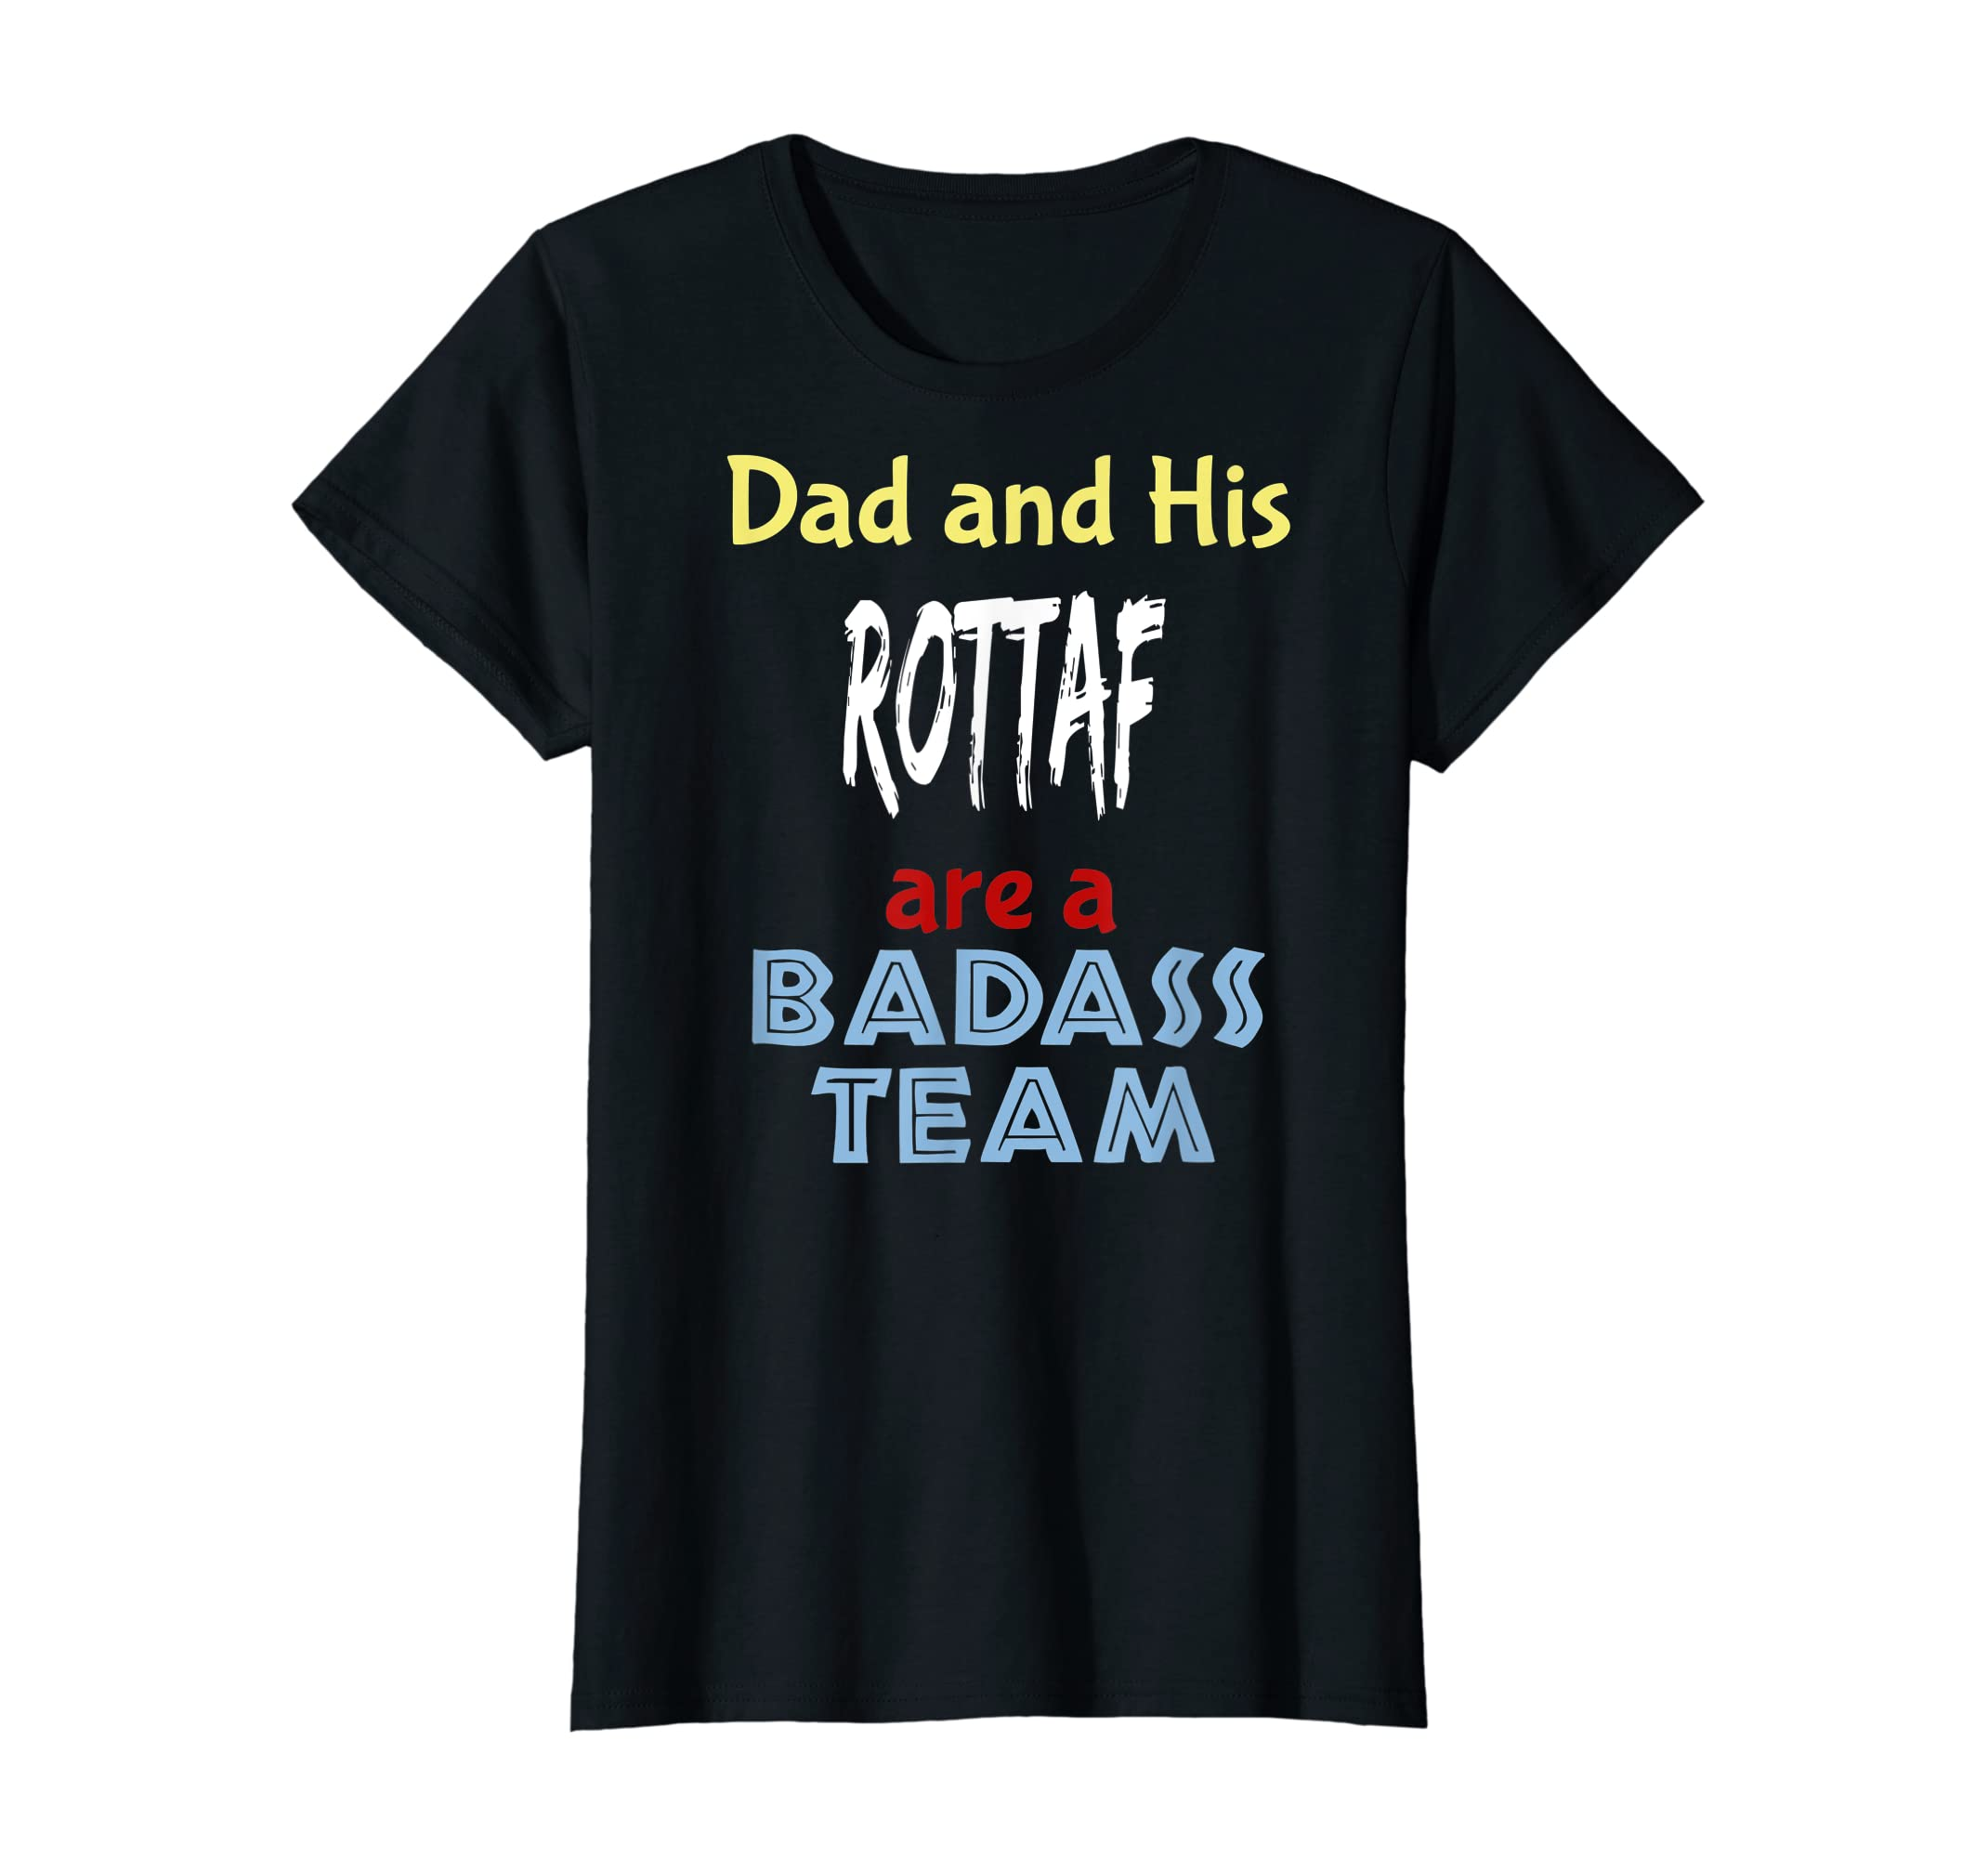 Mens Rottaf Dog Shirt Love Rottweiler + Afghan Hound =  T-Shirt-Women's T-Shirt-Black